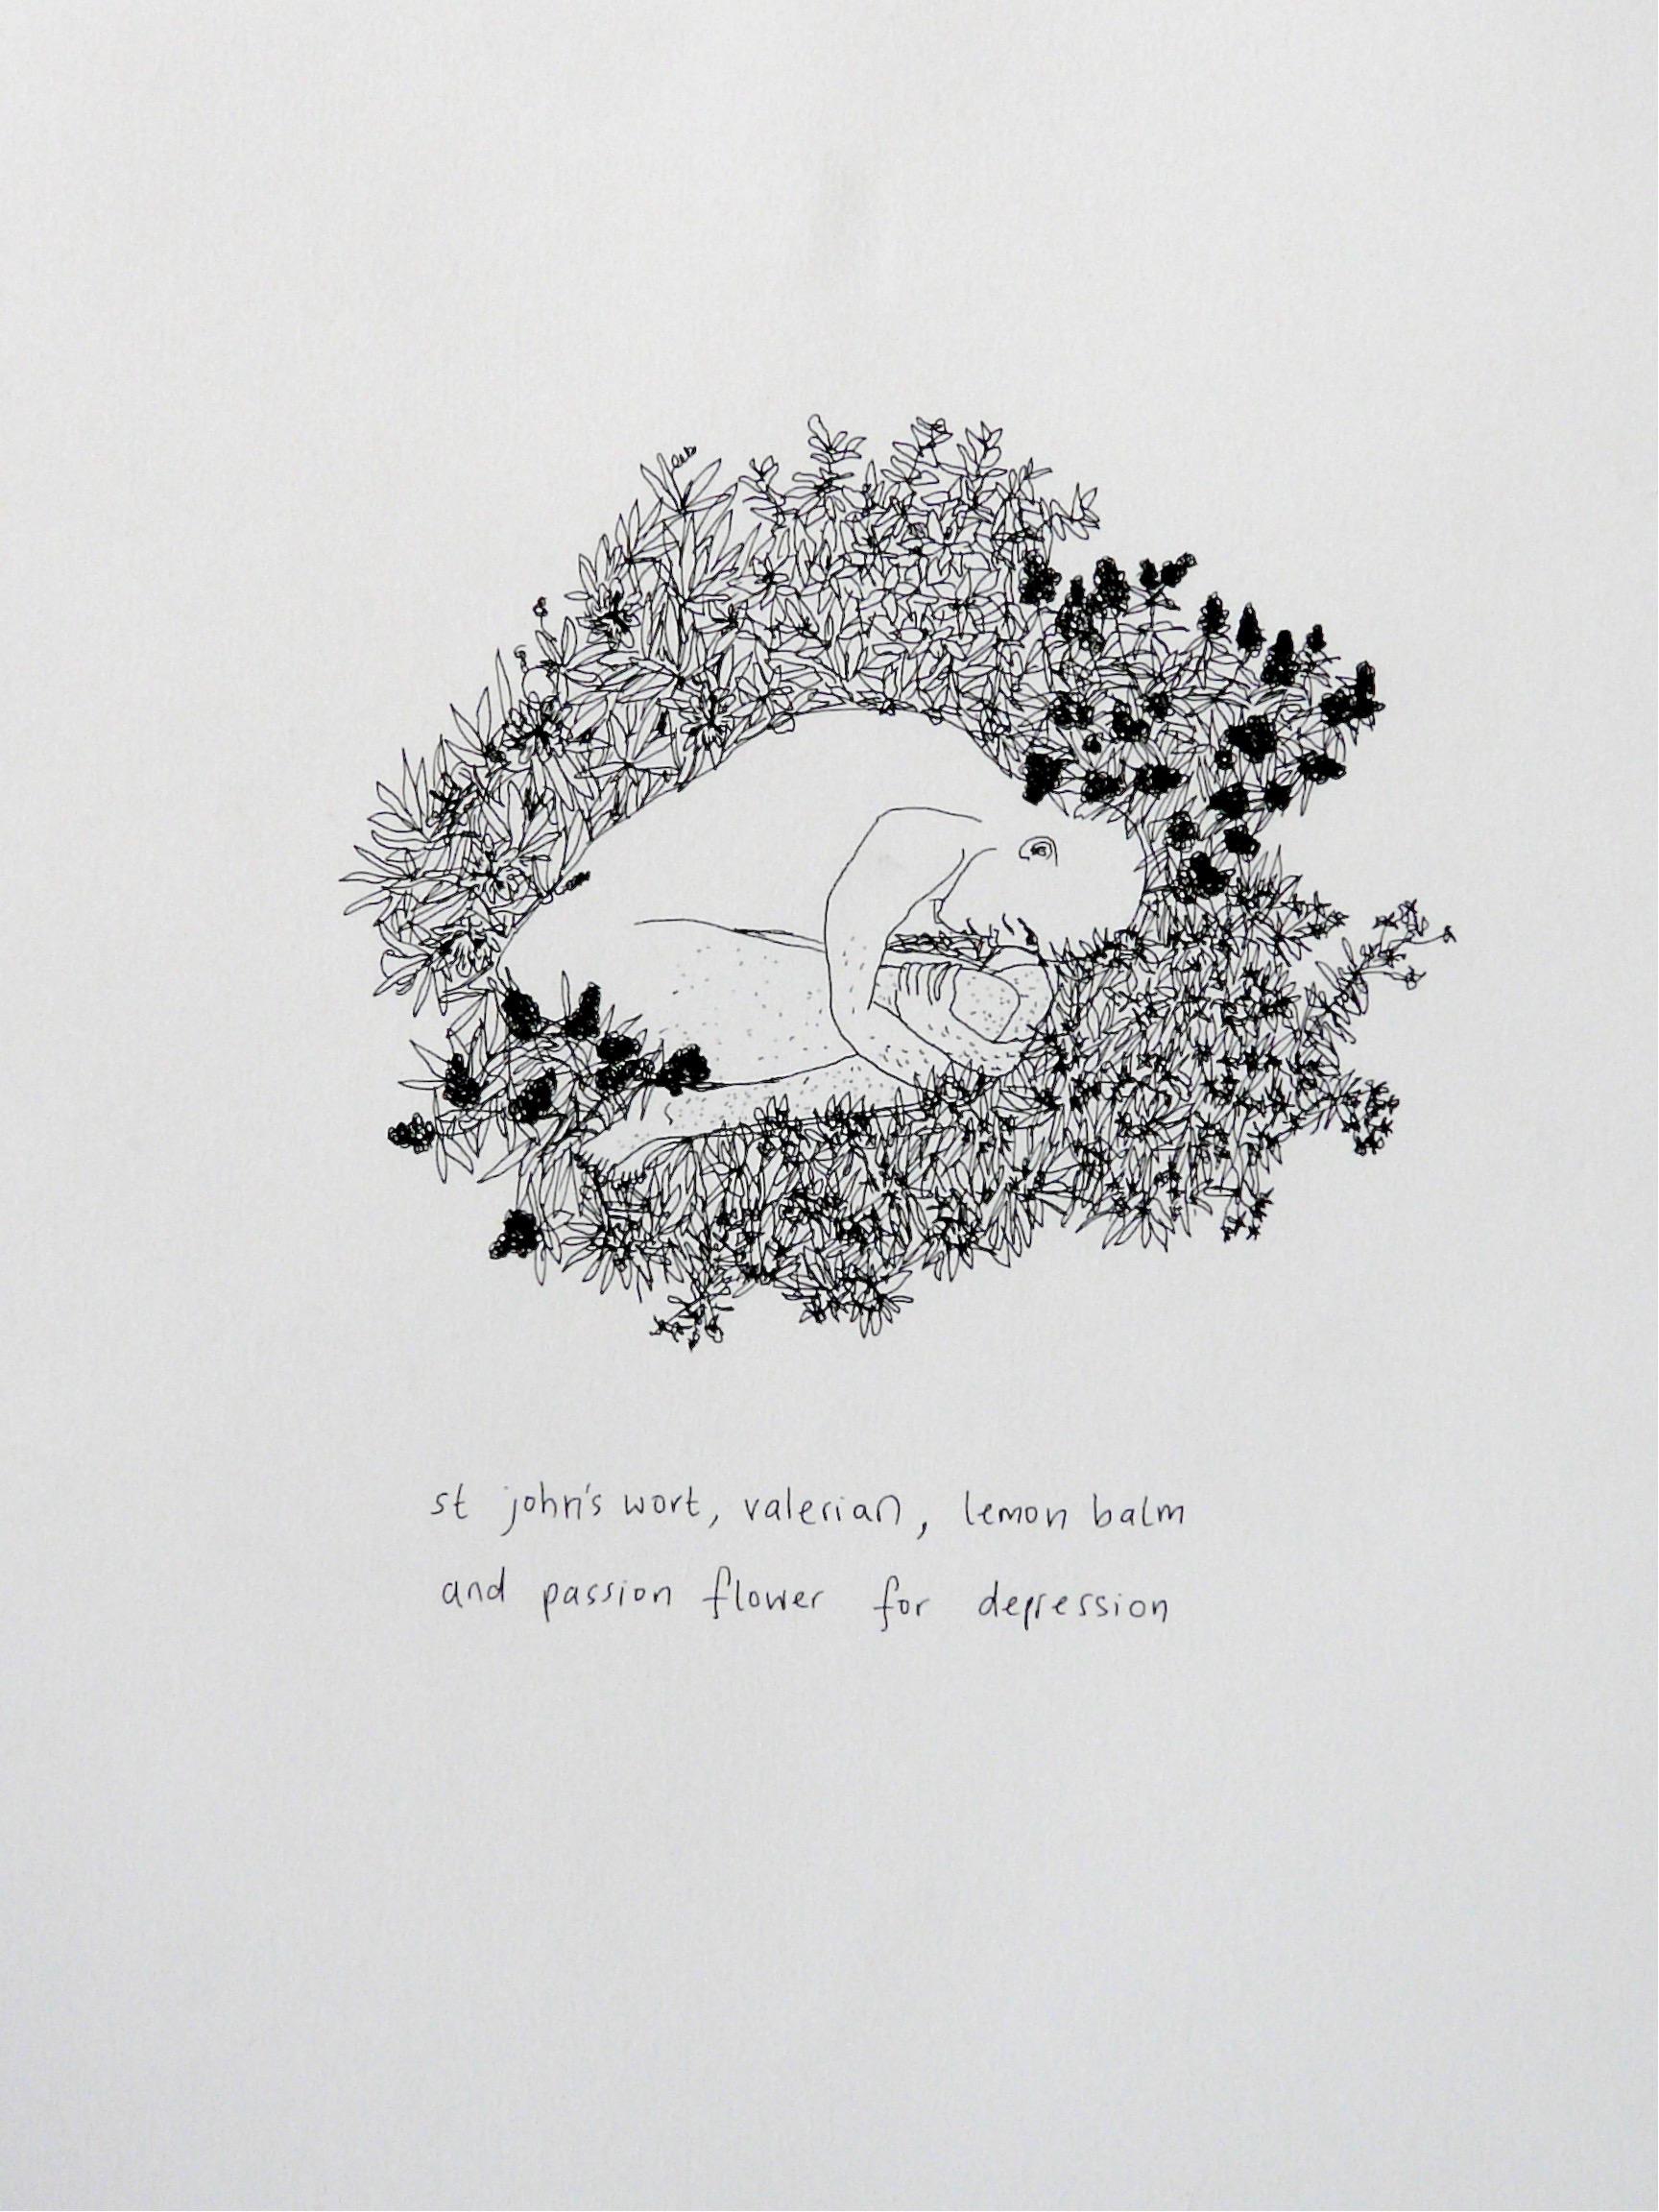 St john's wort. valerian, lemon balm and passion flower for depression,Plants & People Series.